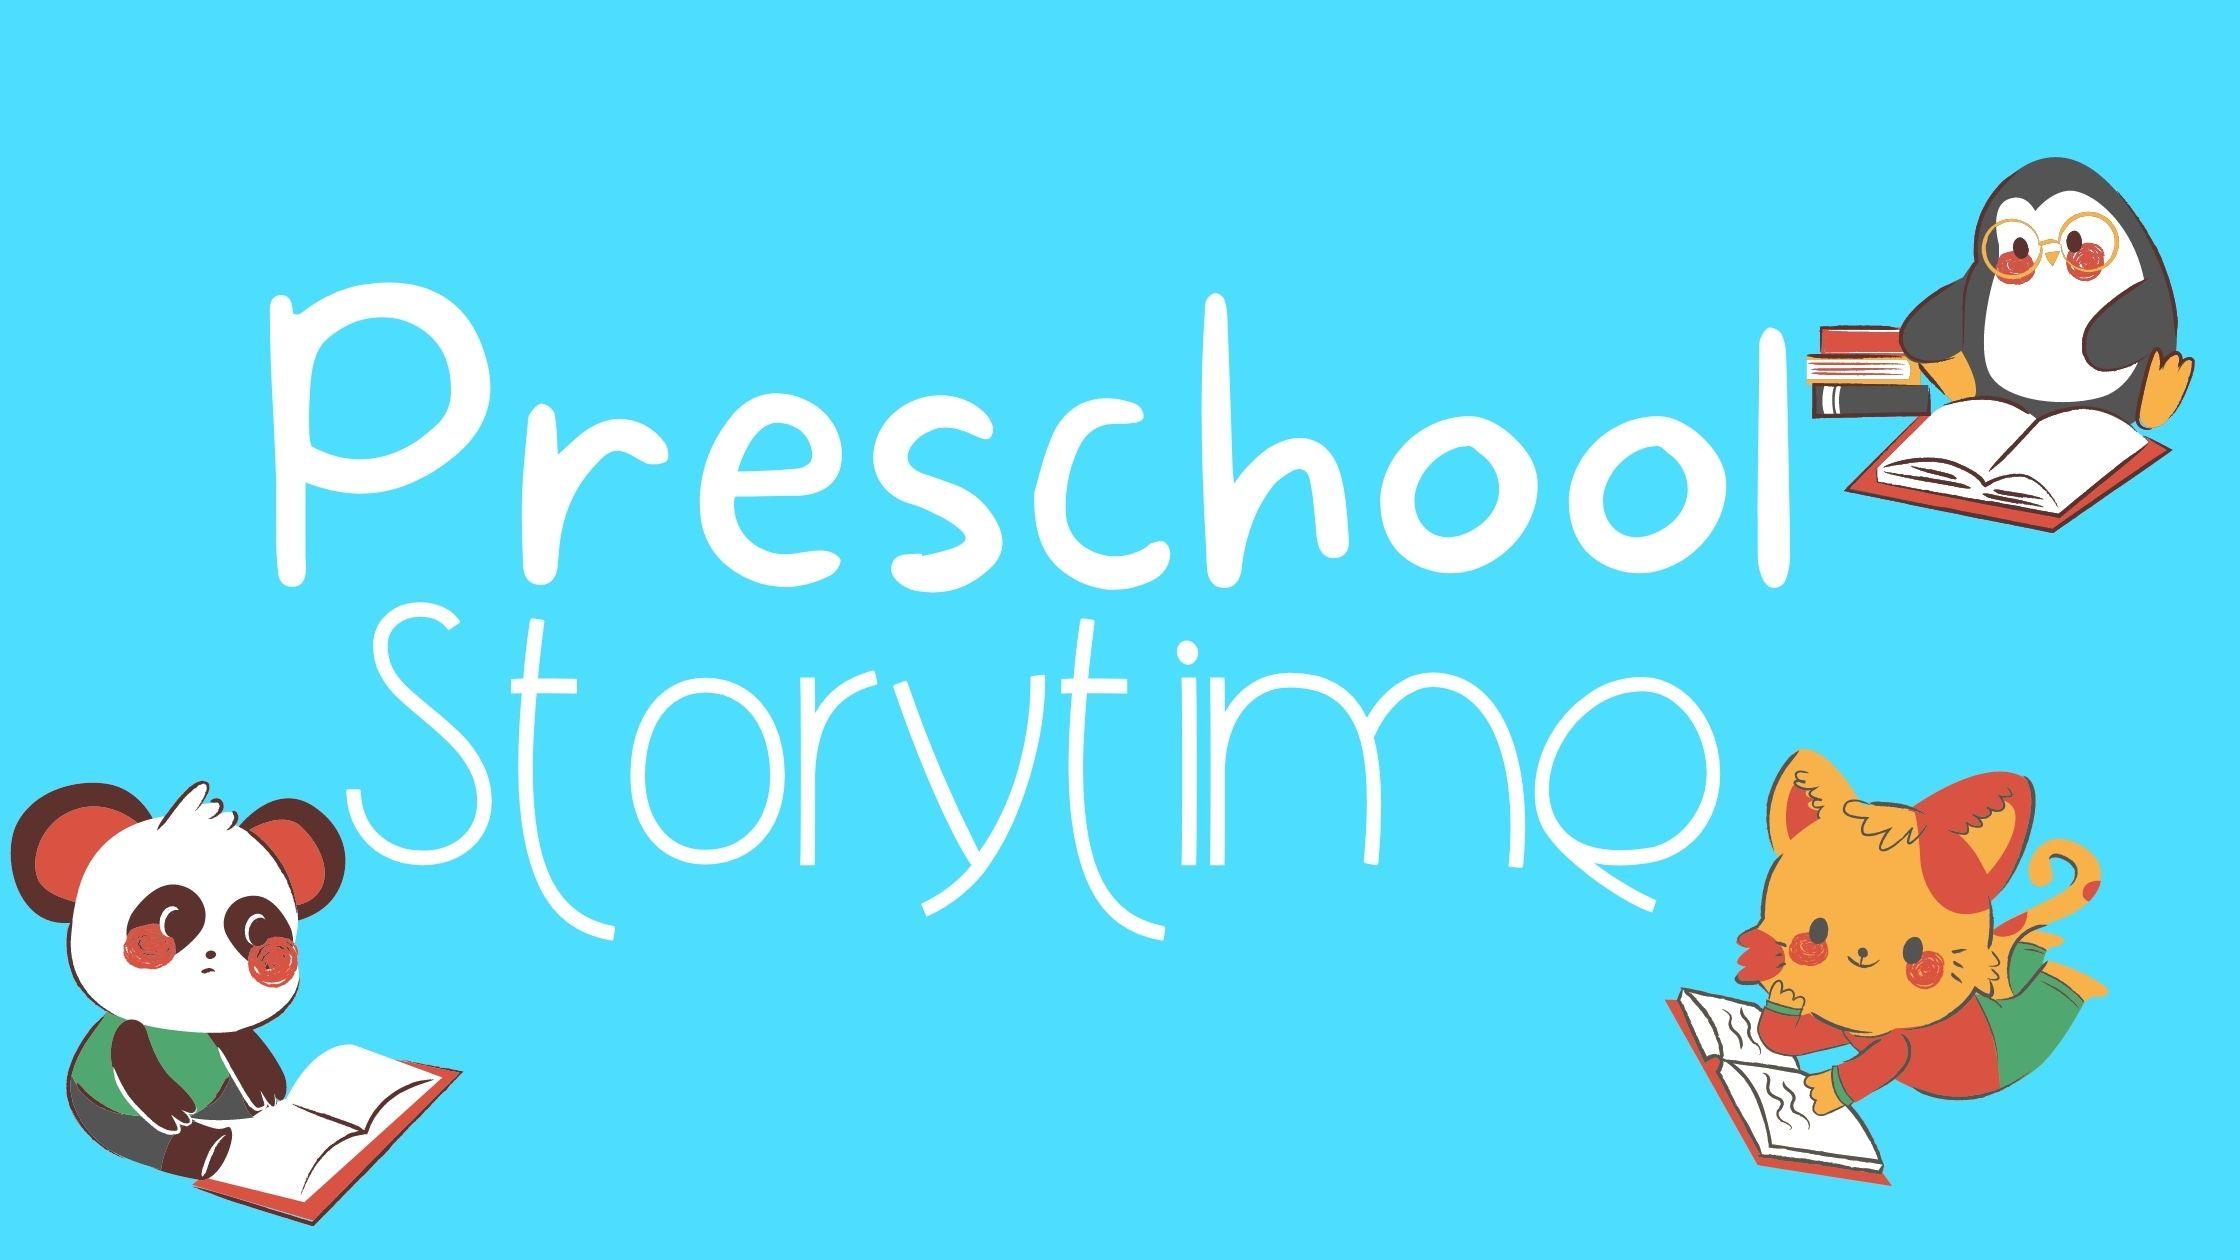 Preschool Storytime cute little penguin, cat, and panda read books